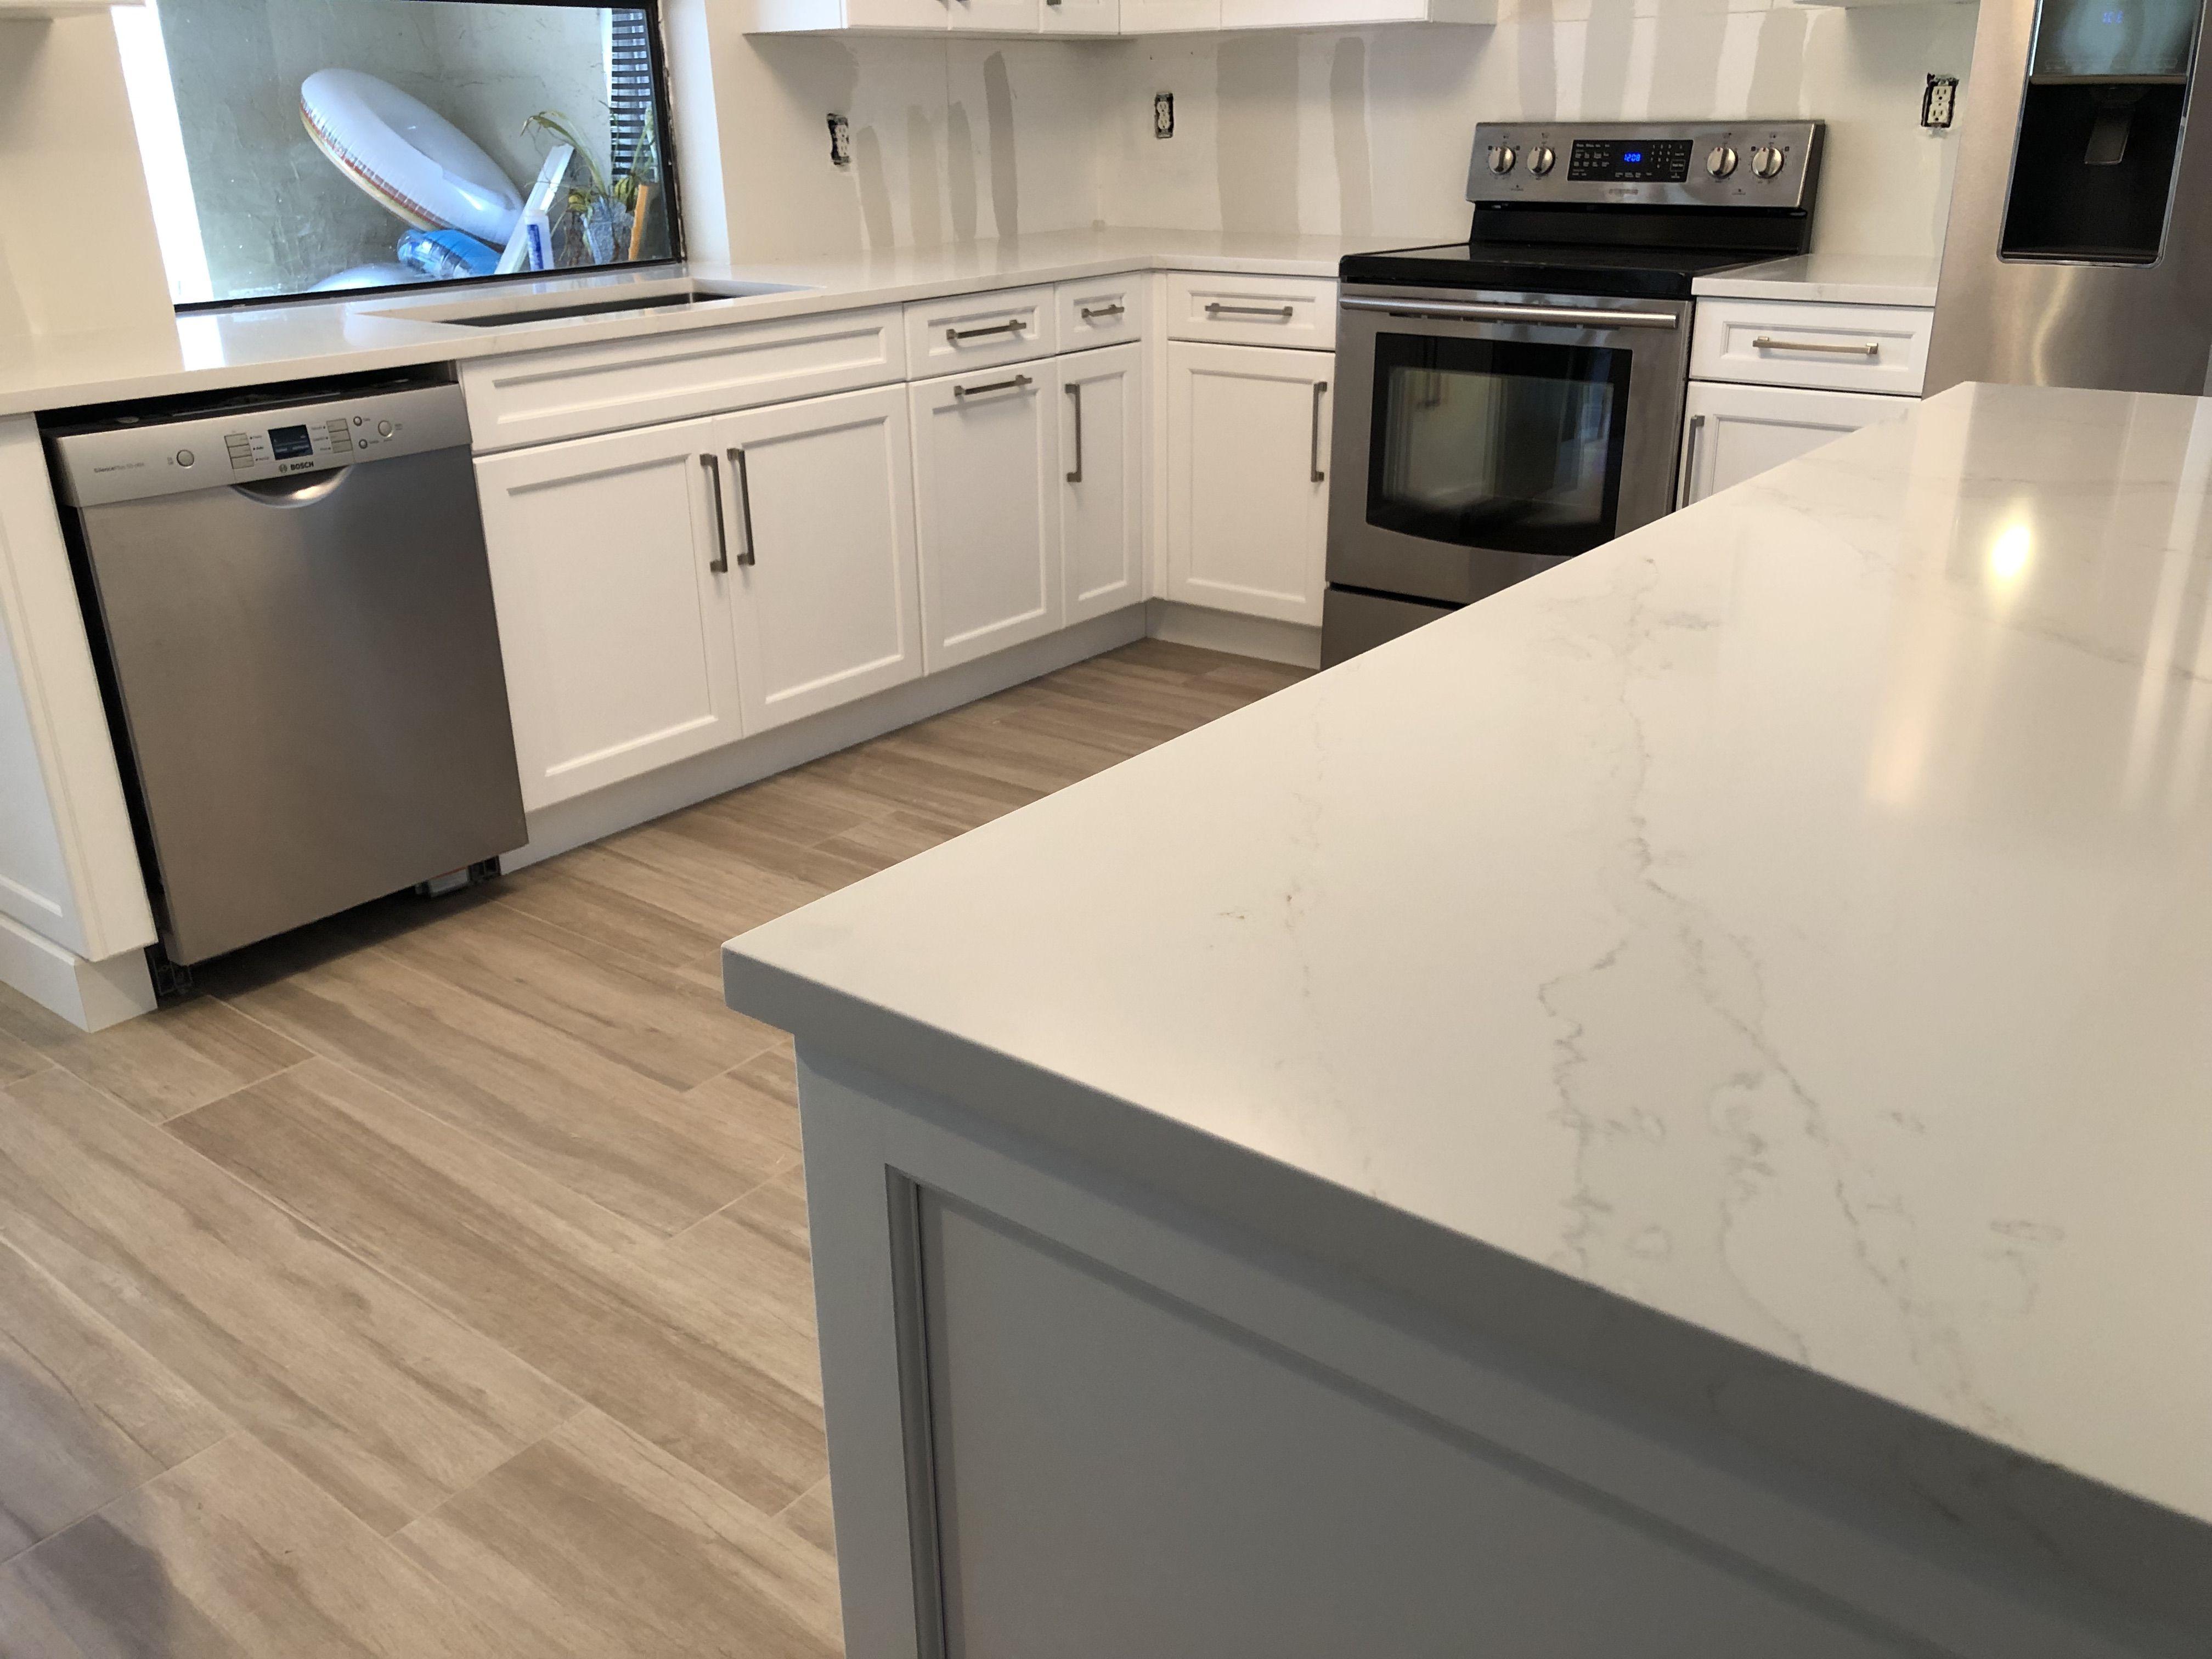 Lyra Silestone Kitchen And Island Kitchen Ideas Pinterest Silestone Kitchen Silestone Countertops Kitchen Countertops White Cabinets